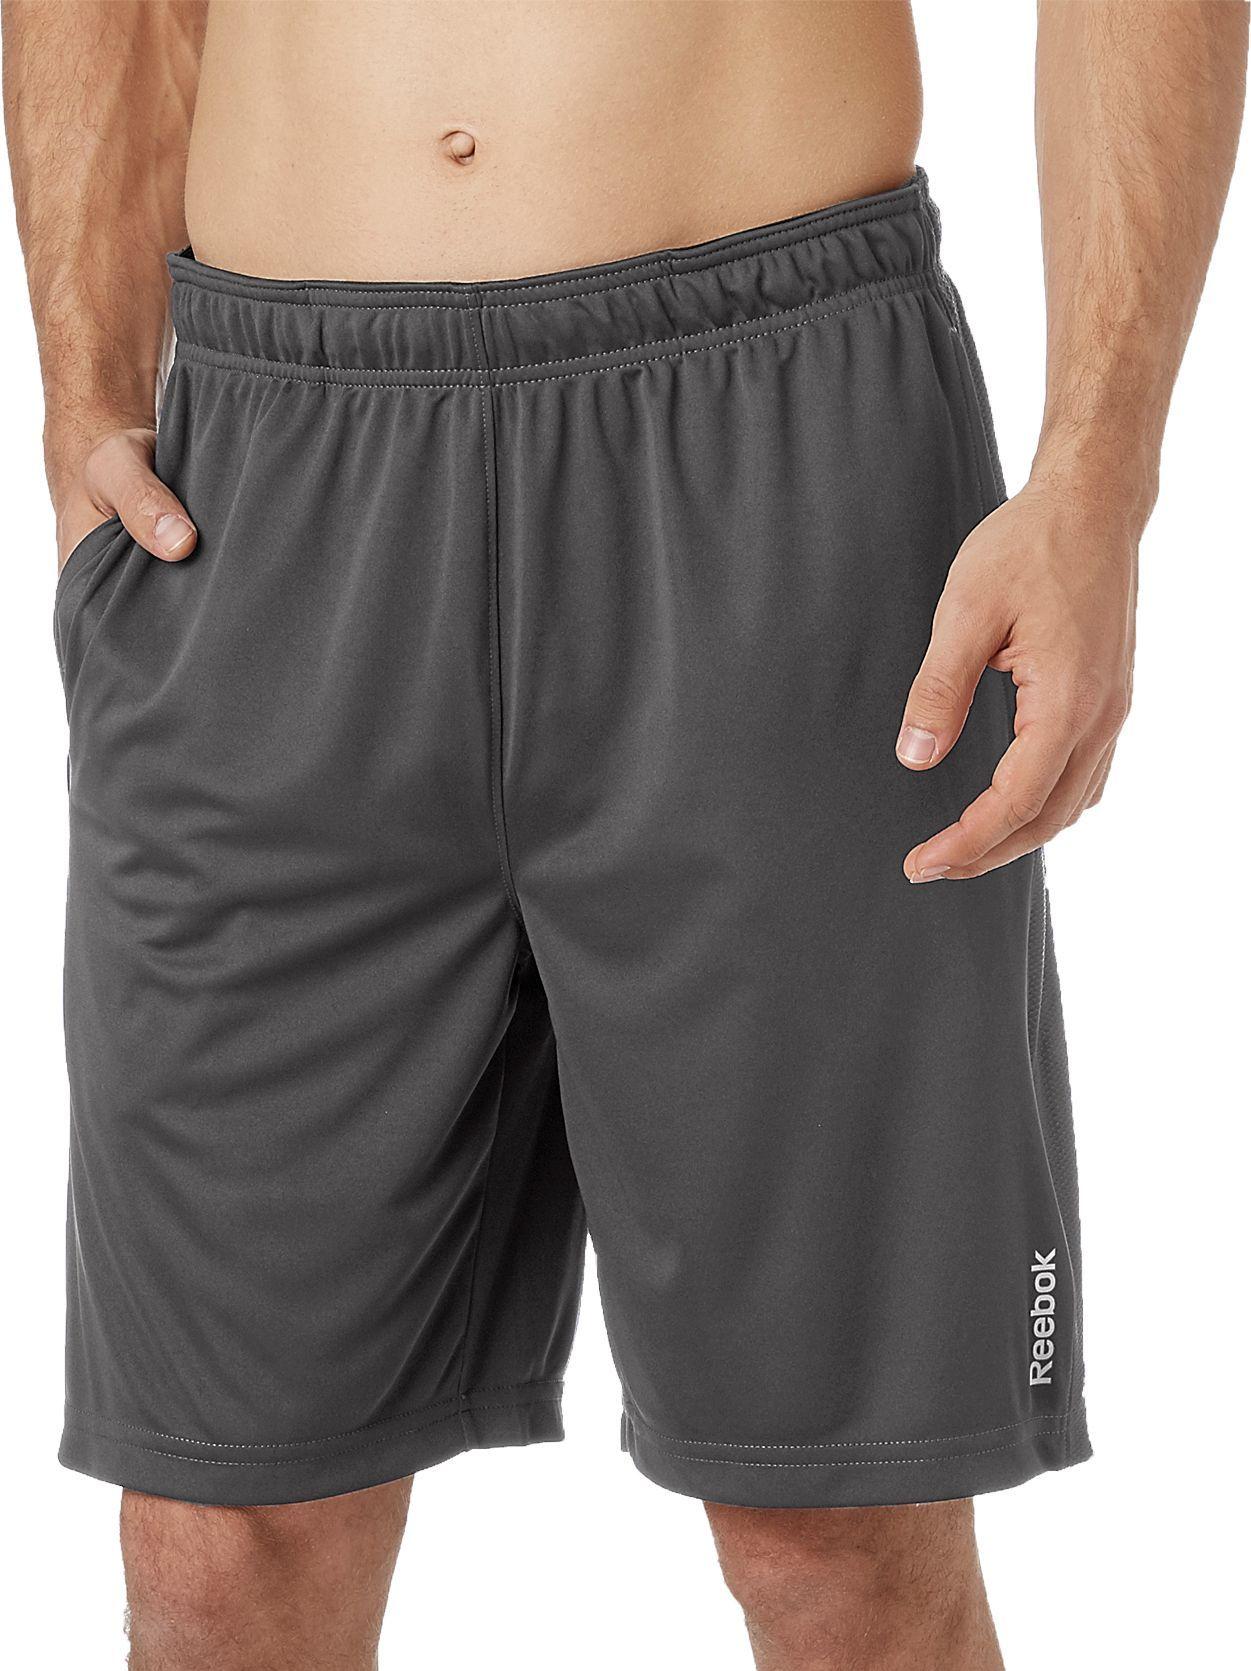 c2c0dcd01b Reebok Men's Solid Performance Shorts | Products | Reebok, Workout ...